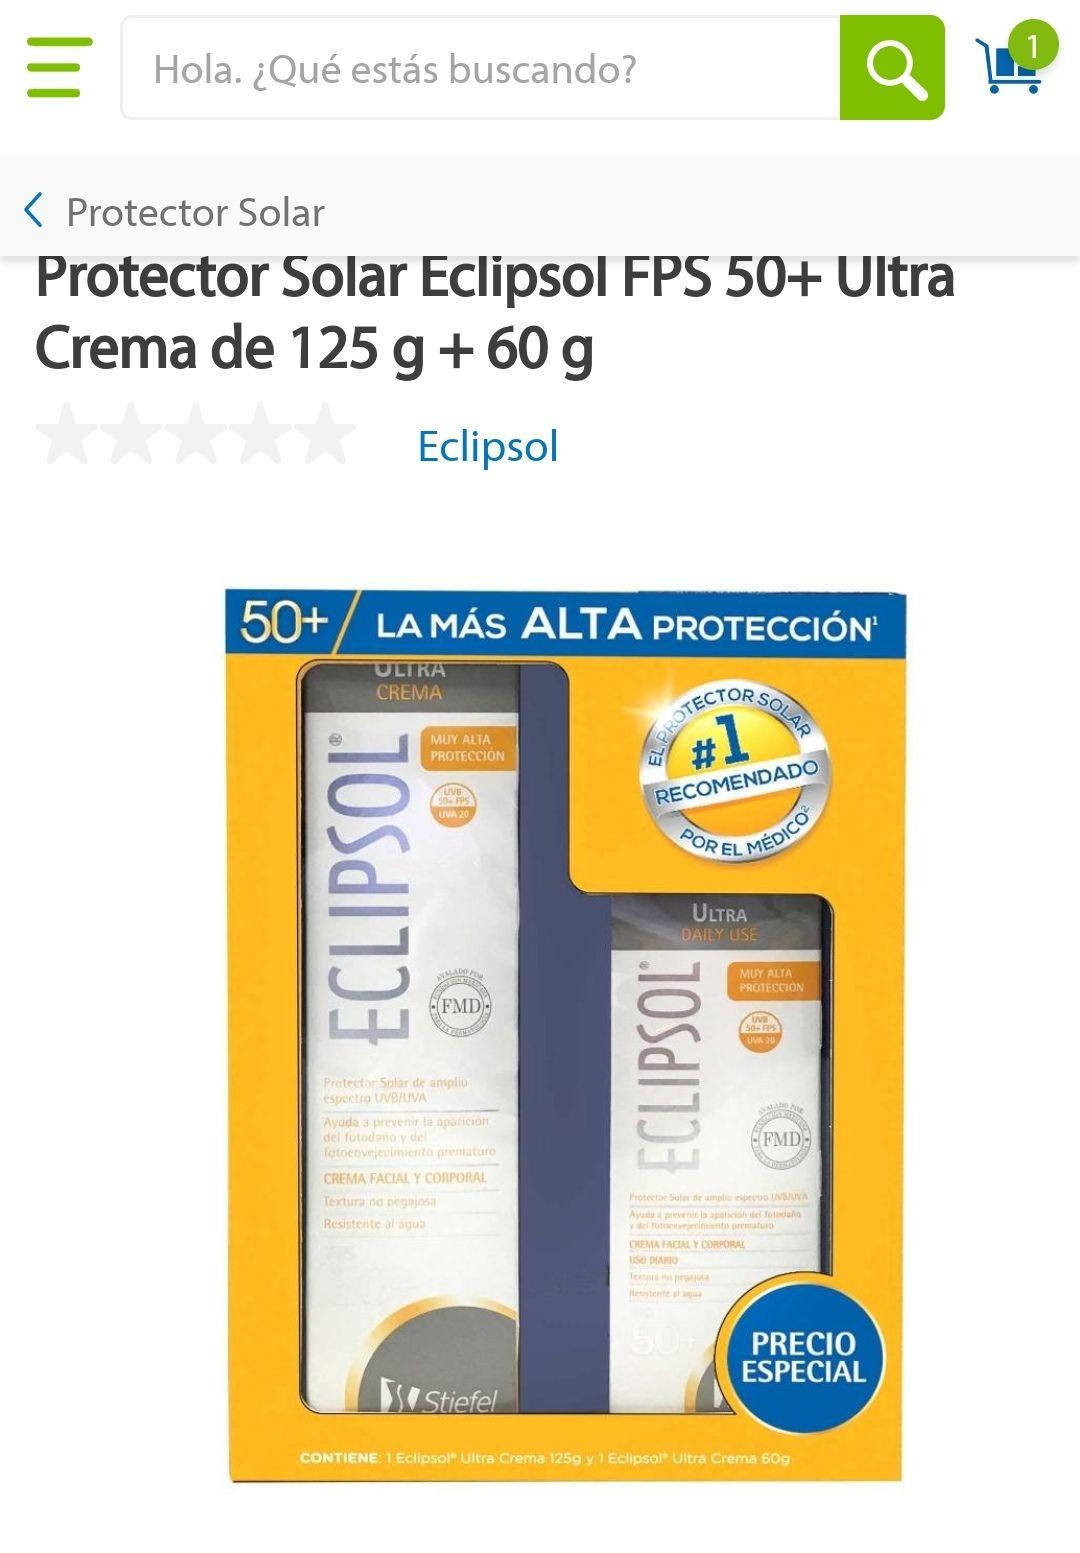 Sams. Bloqueador solar Eclipsol kit. FPS 50